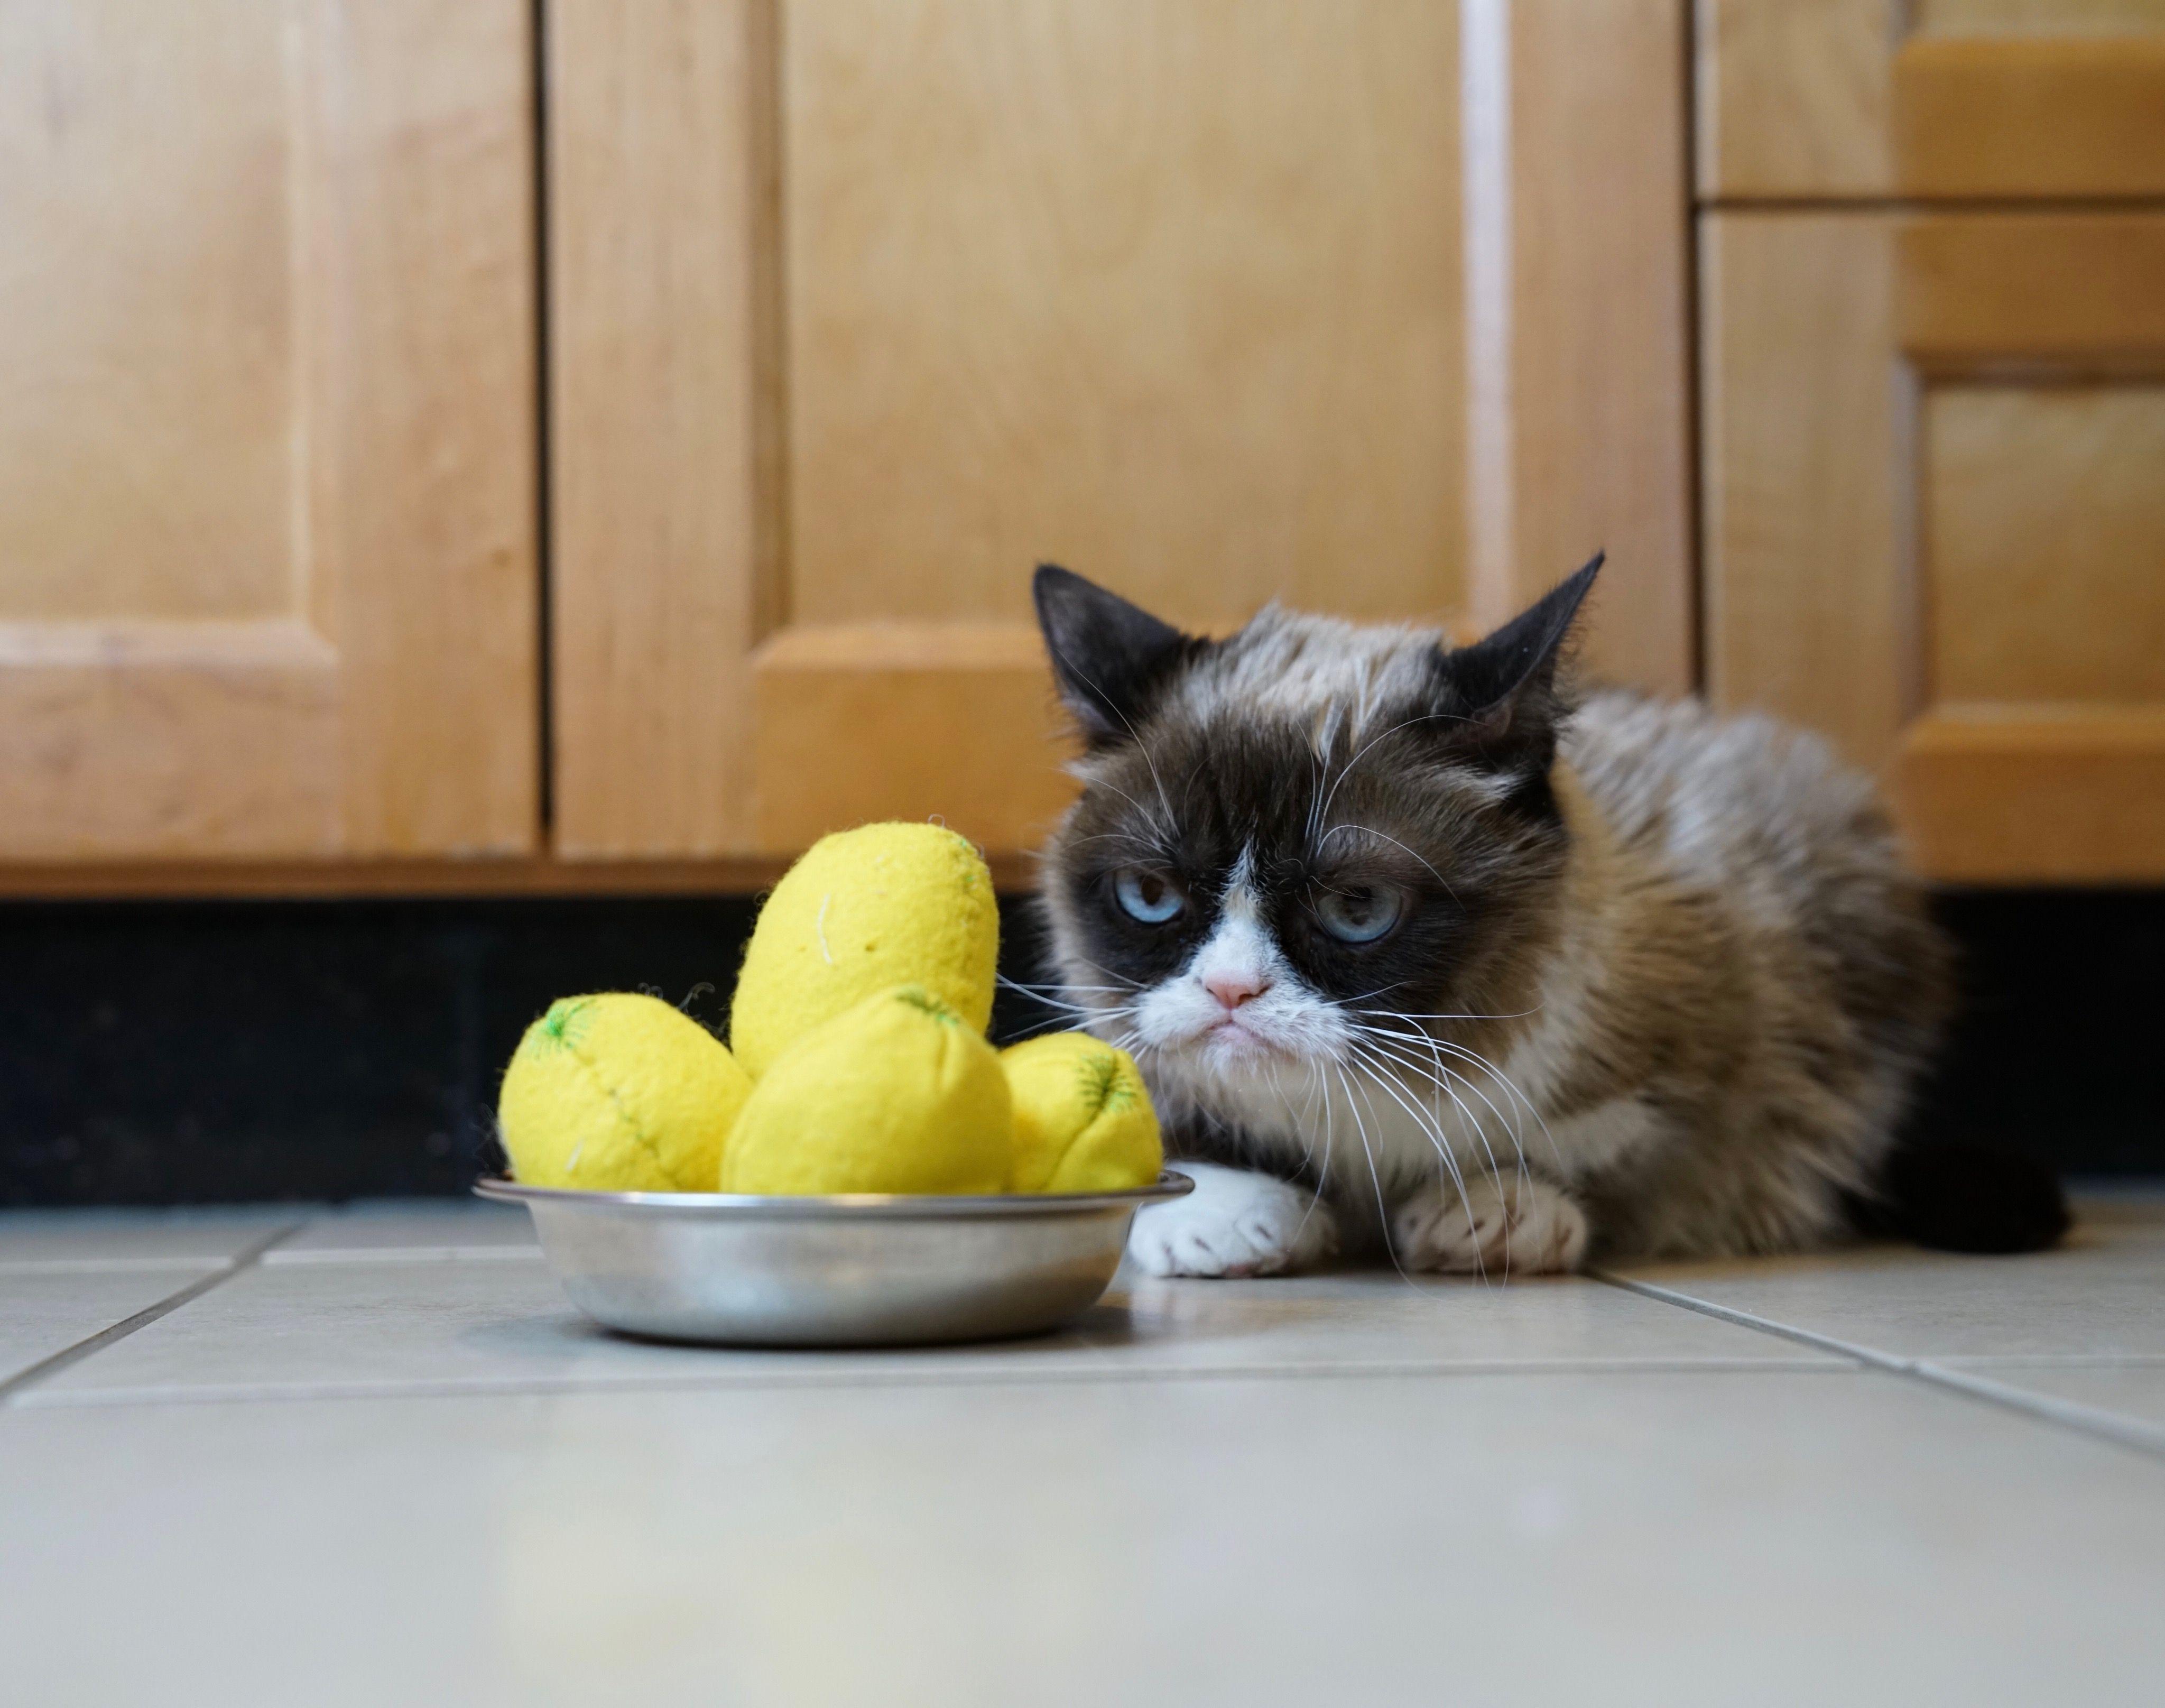 Grumpy Cat Toys Are Available At Petsmart Enter Grumpy Cat Lemon Balls According To Grumpy When Life Gives You Lemons Diy Cat Food Cat Plants Teacup Cats